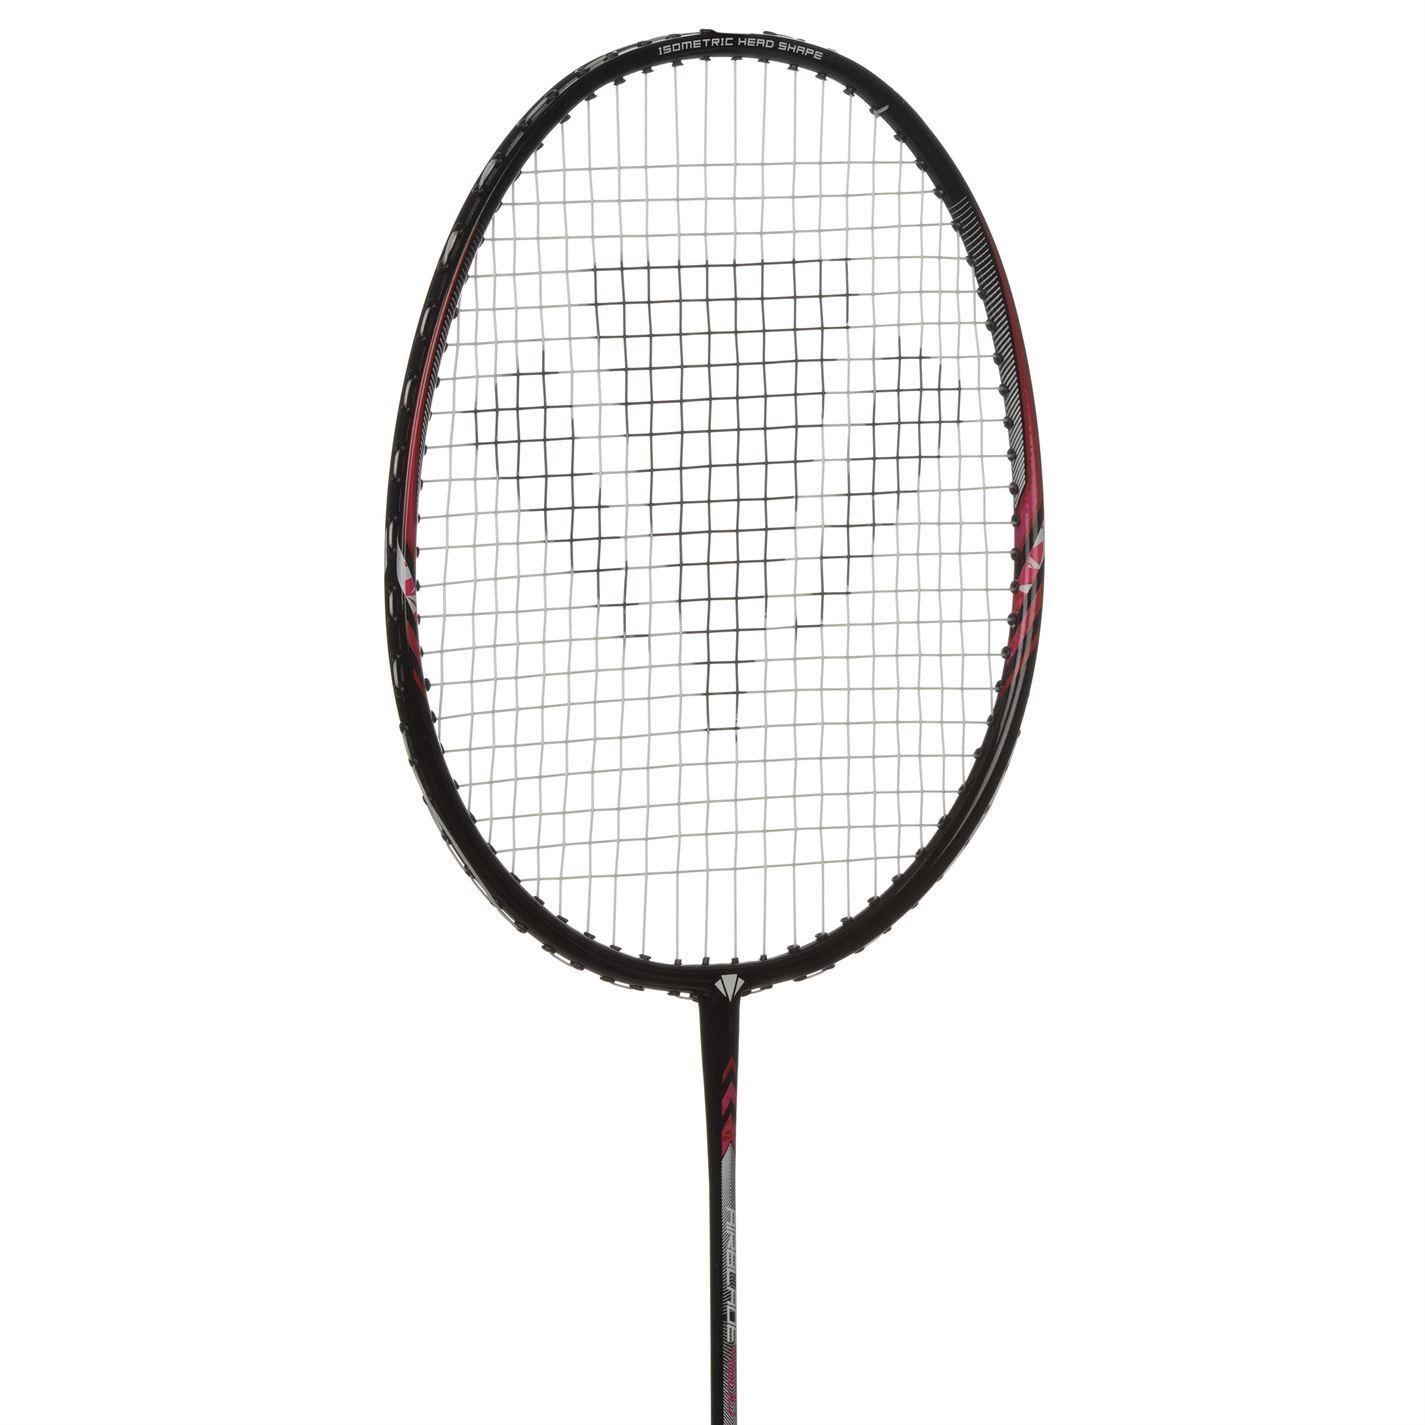 Carlton Airblade 4500 Badminton Racket Play Game Court Sports